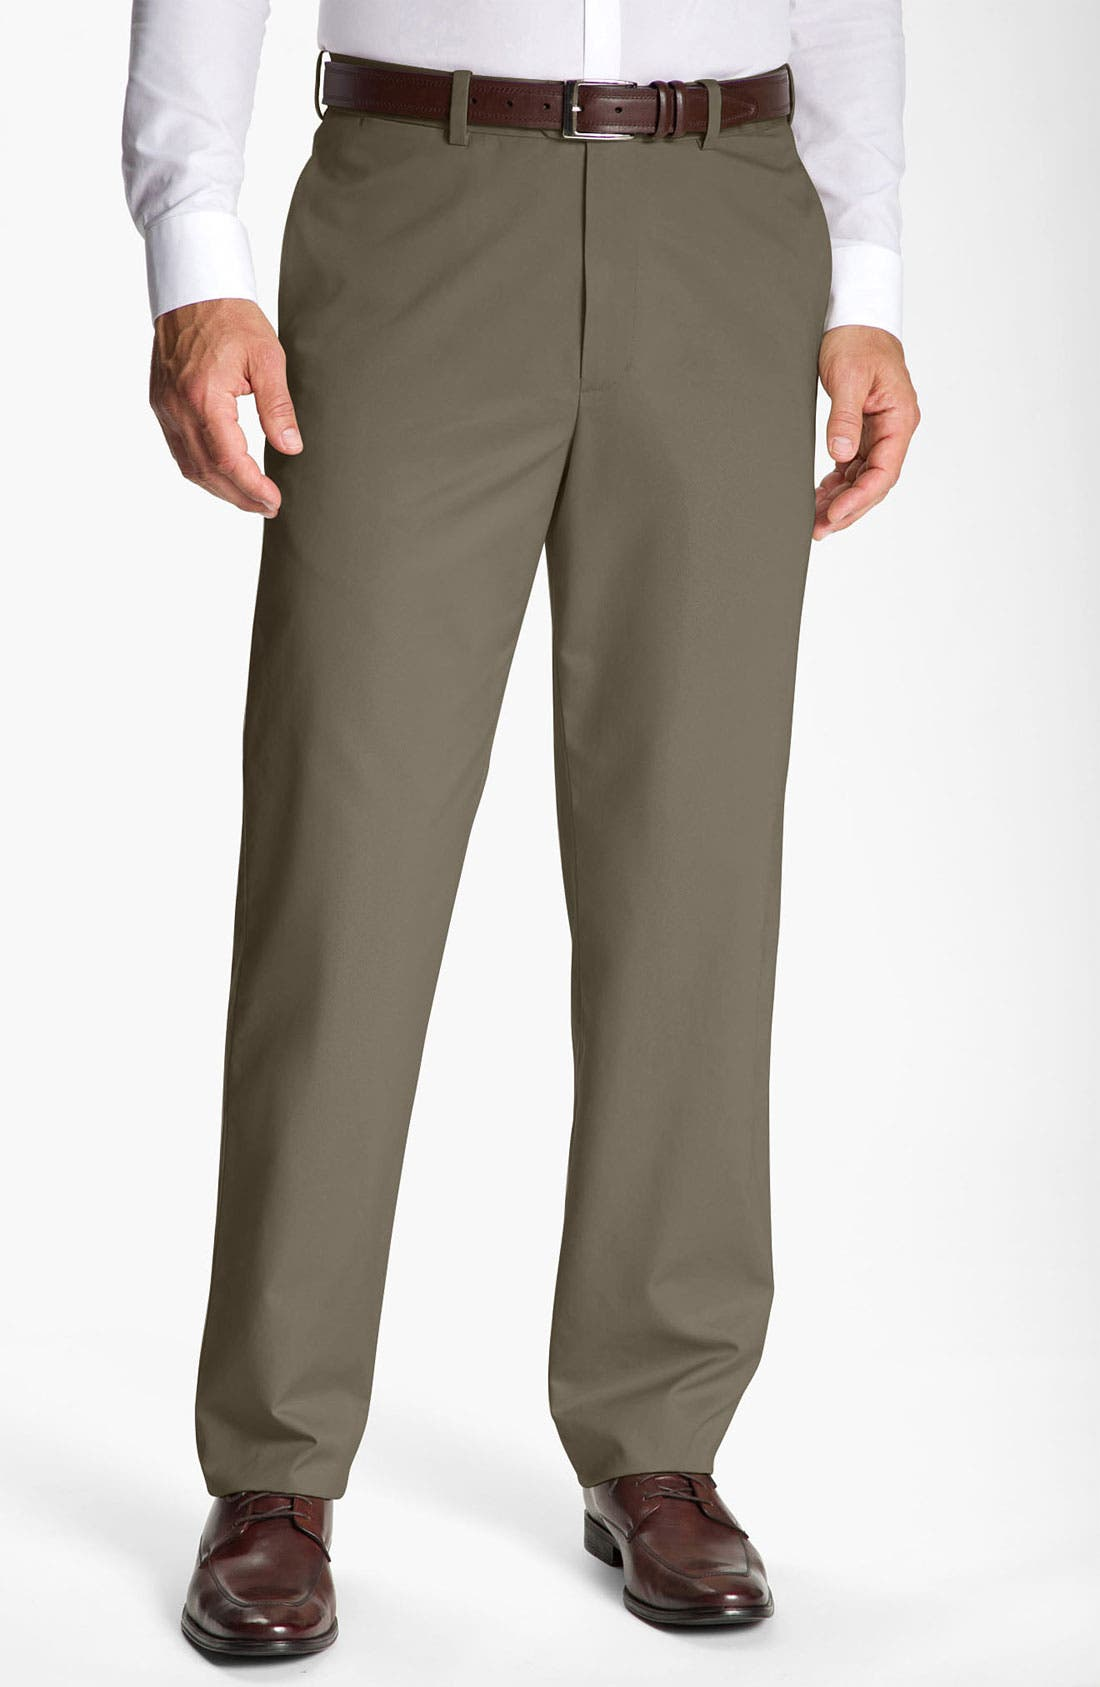 Main Image - John W. Nordstrom® Smartcare™ Flat Front Supima® Cotton Pants